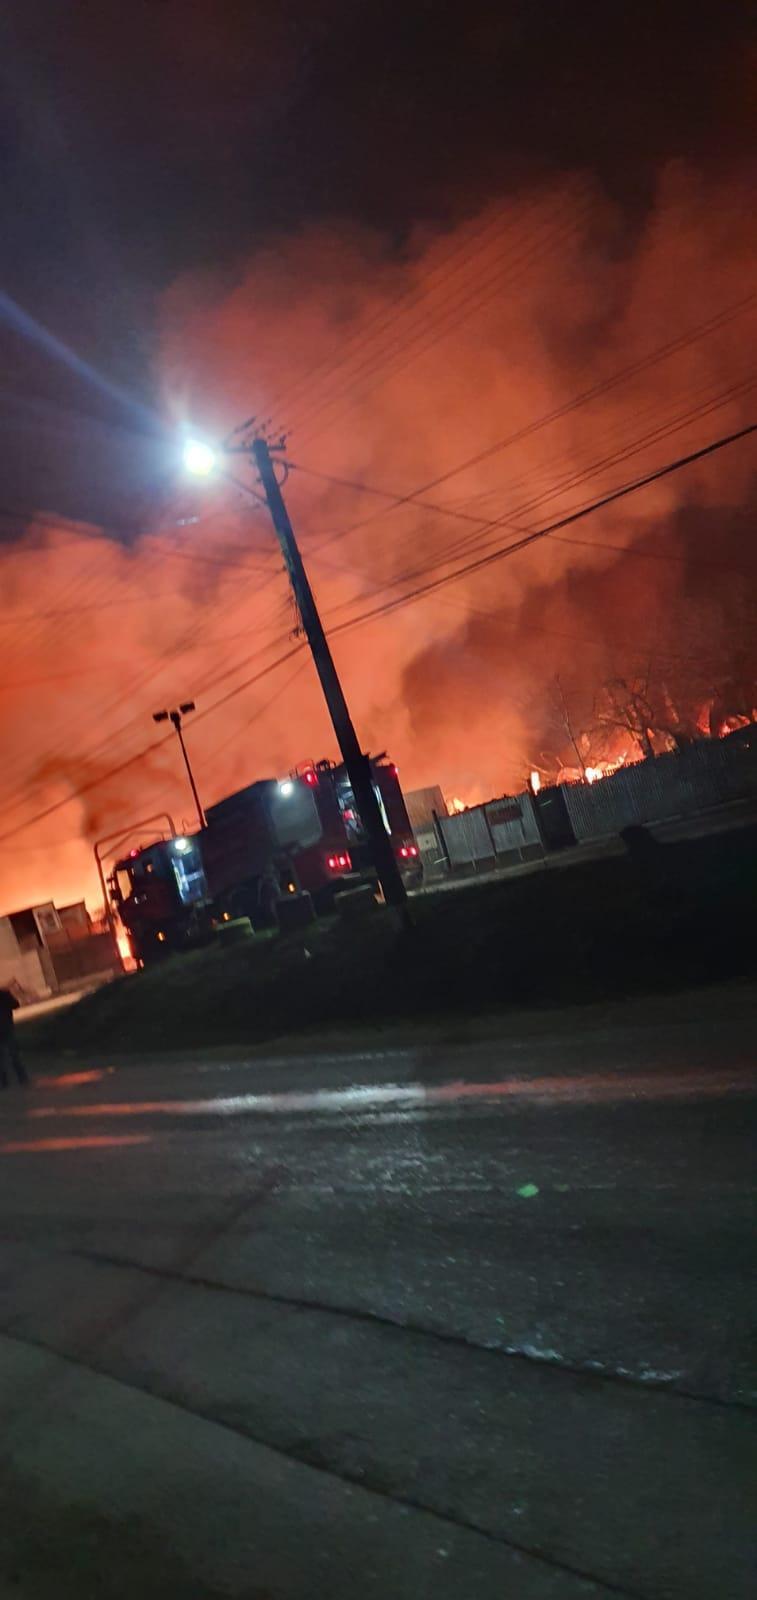 incendiu-urlati-fabrica-saltele-interventie-isu-prahova_8076d.jpg